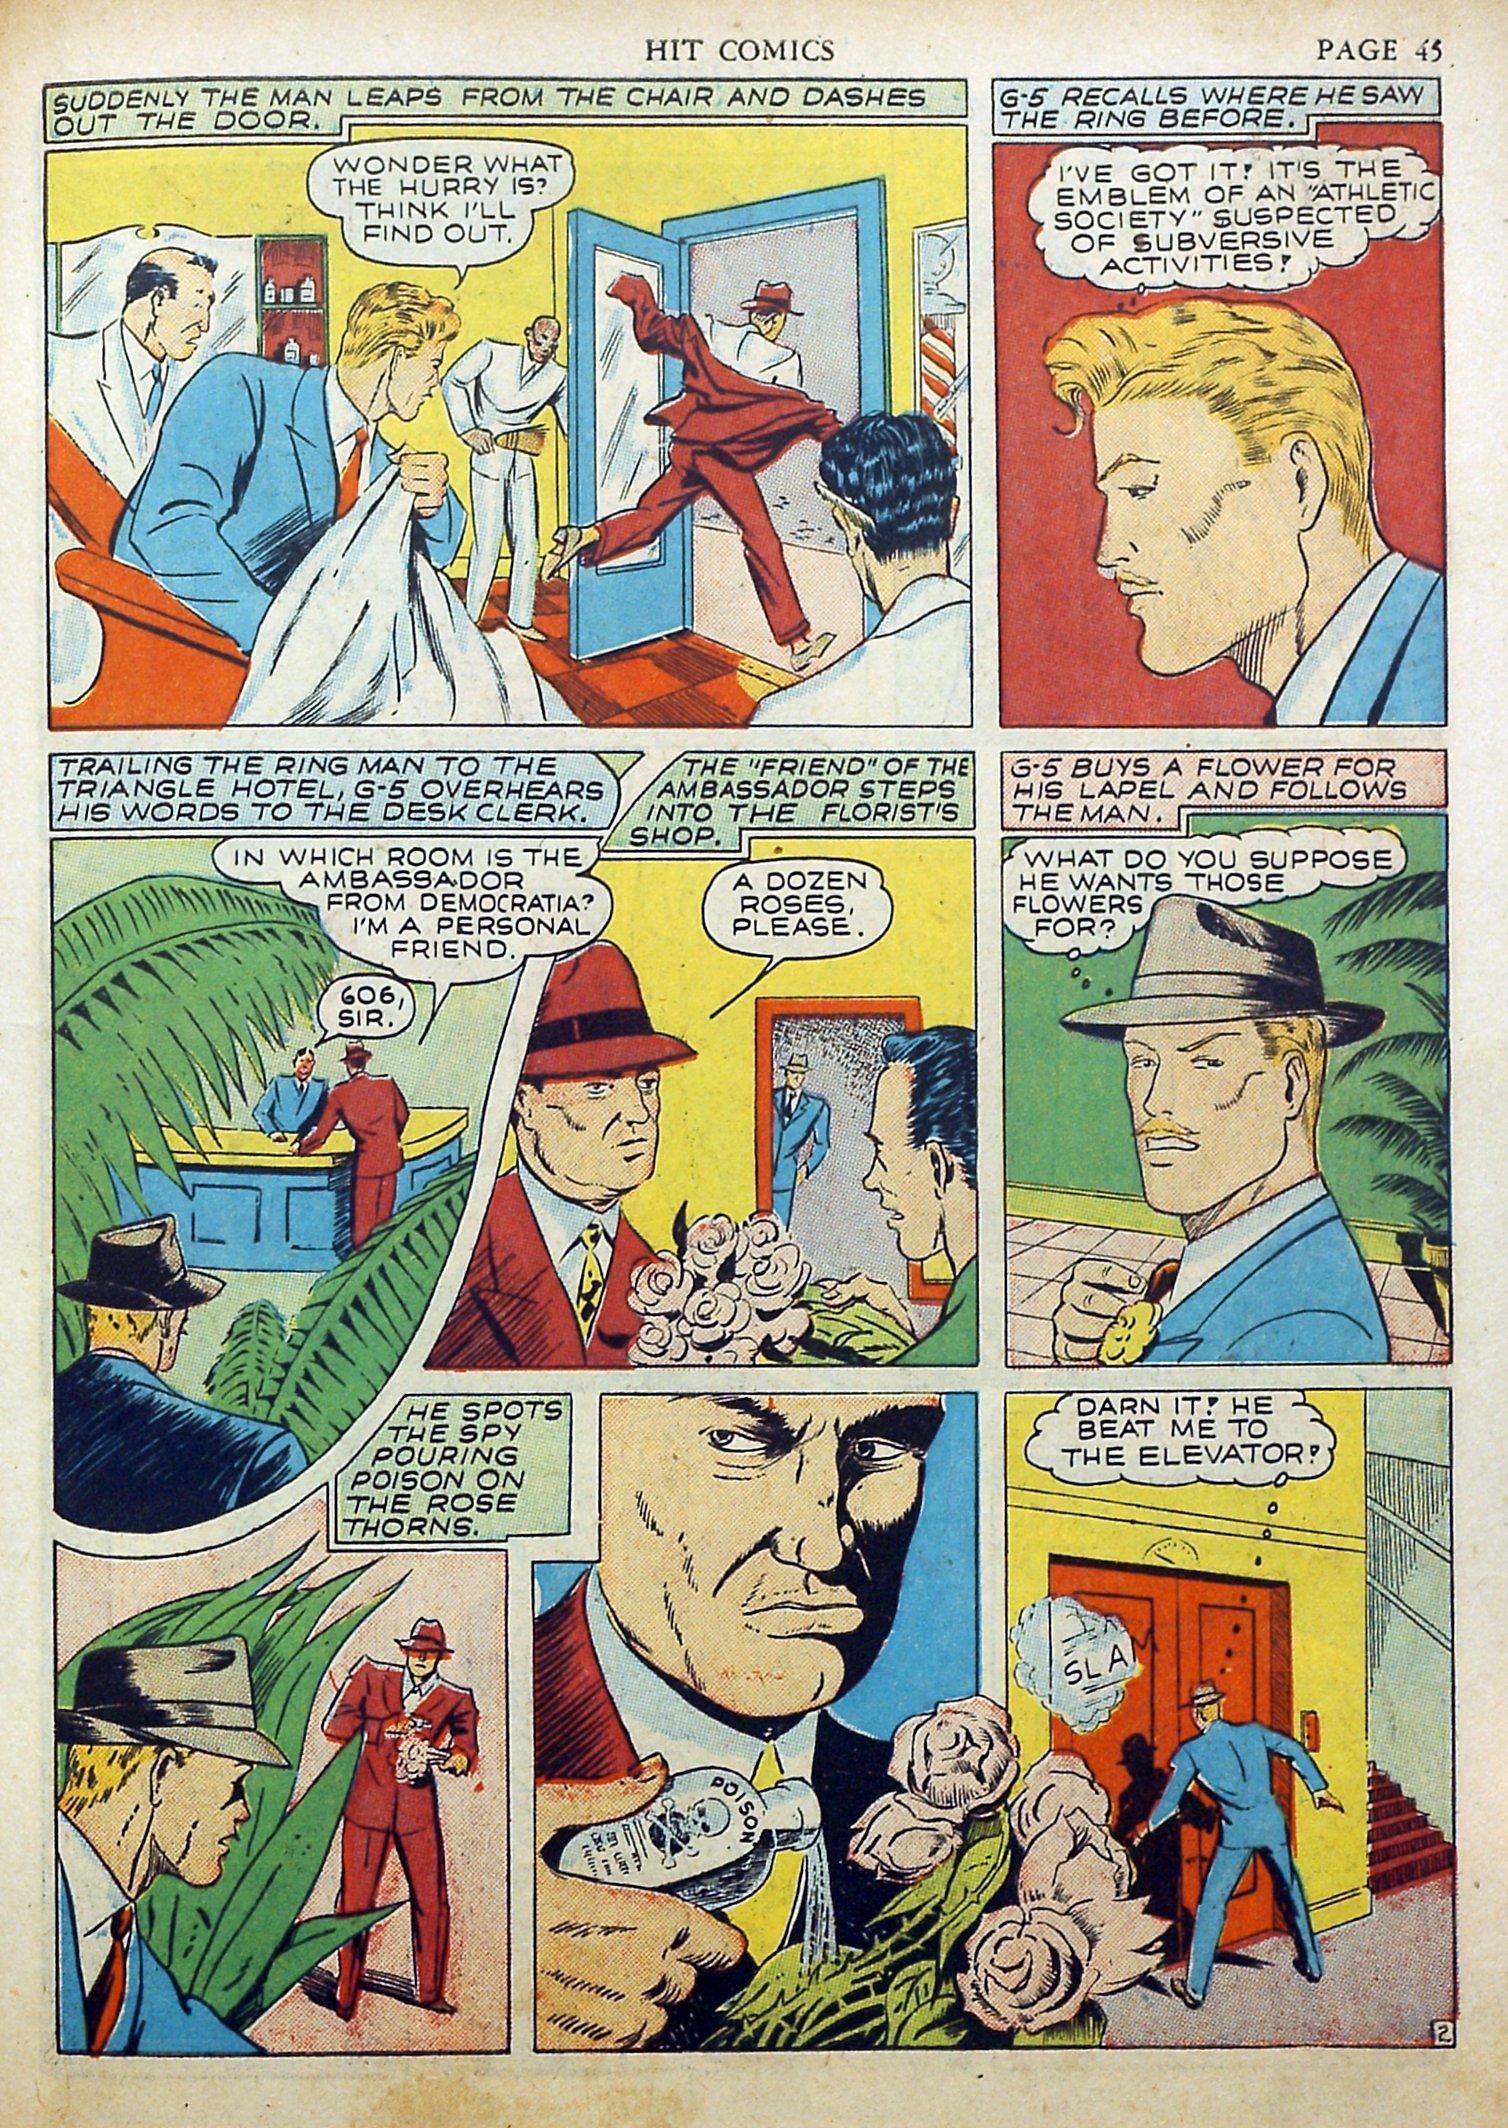 Read online Hit Comics comic -  Issue #17 - 47